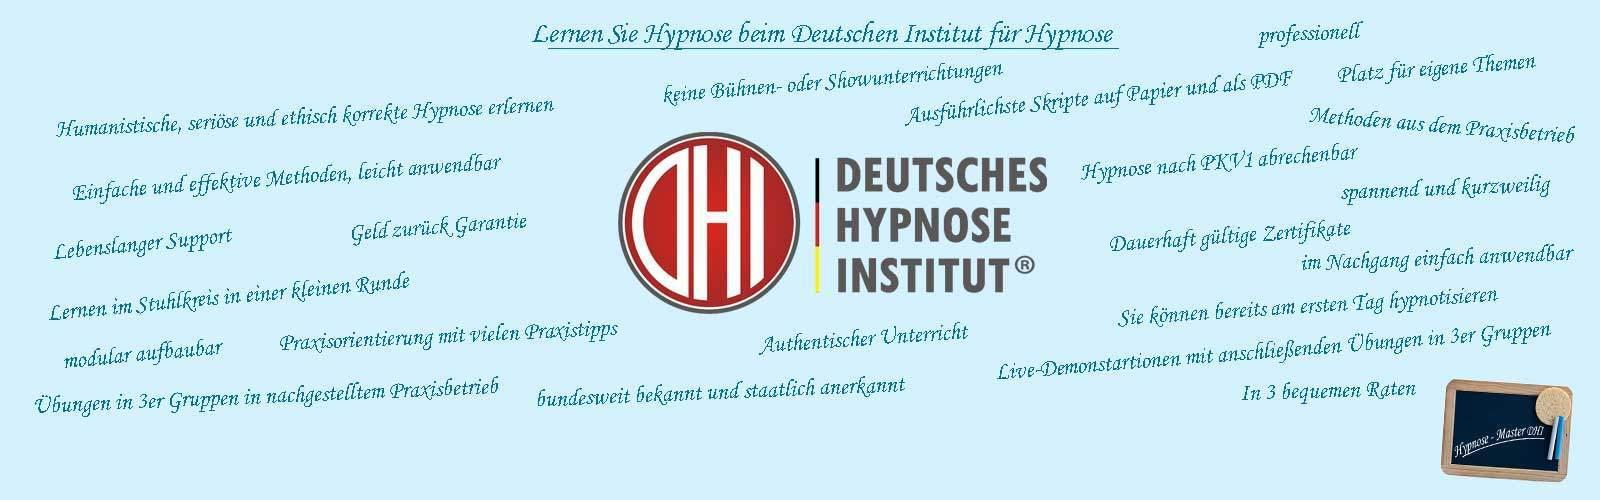 hypnoseausbildungen-seminare-kurse-lernen-dhi